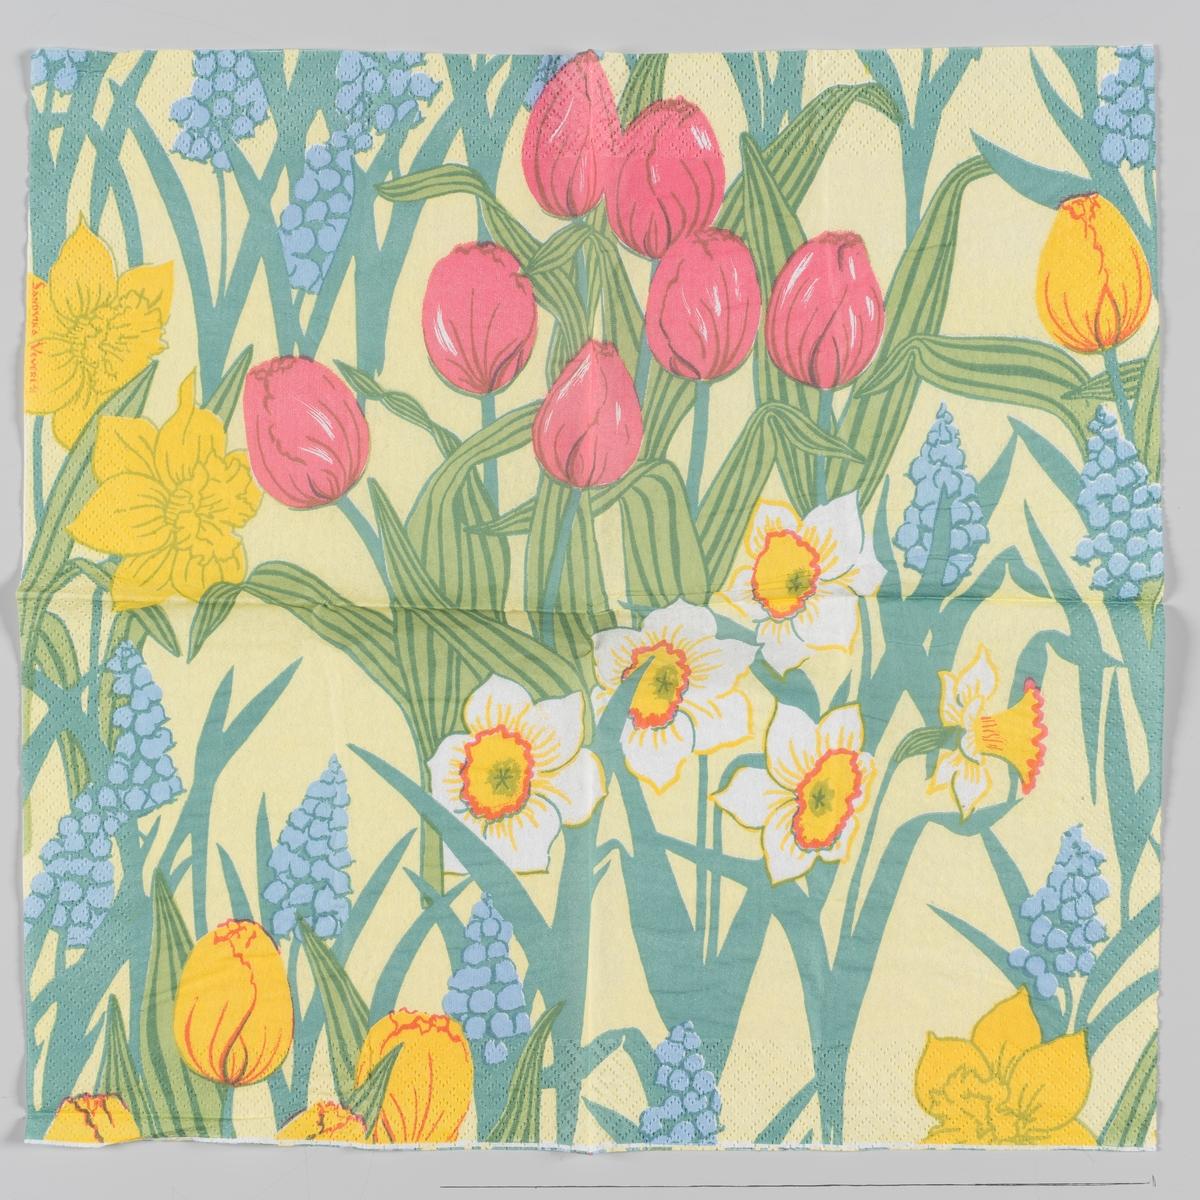 Pinseliljer, påskeliljer, perleblomster og røde og gule tulipaner,